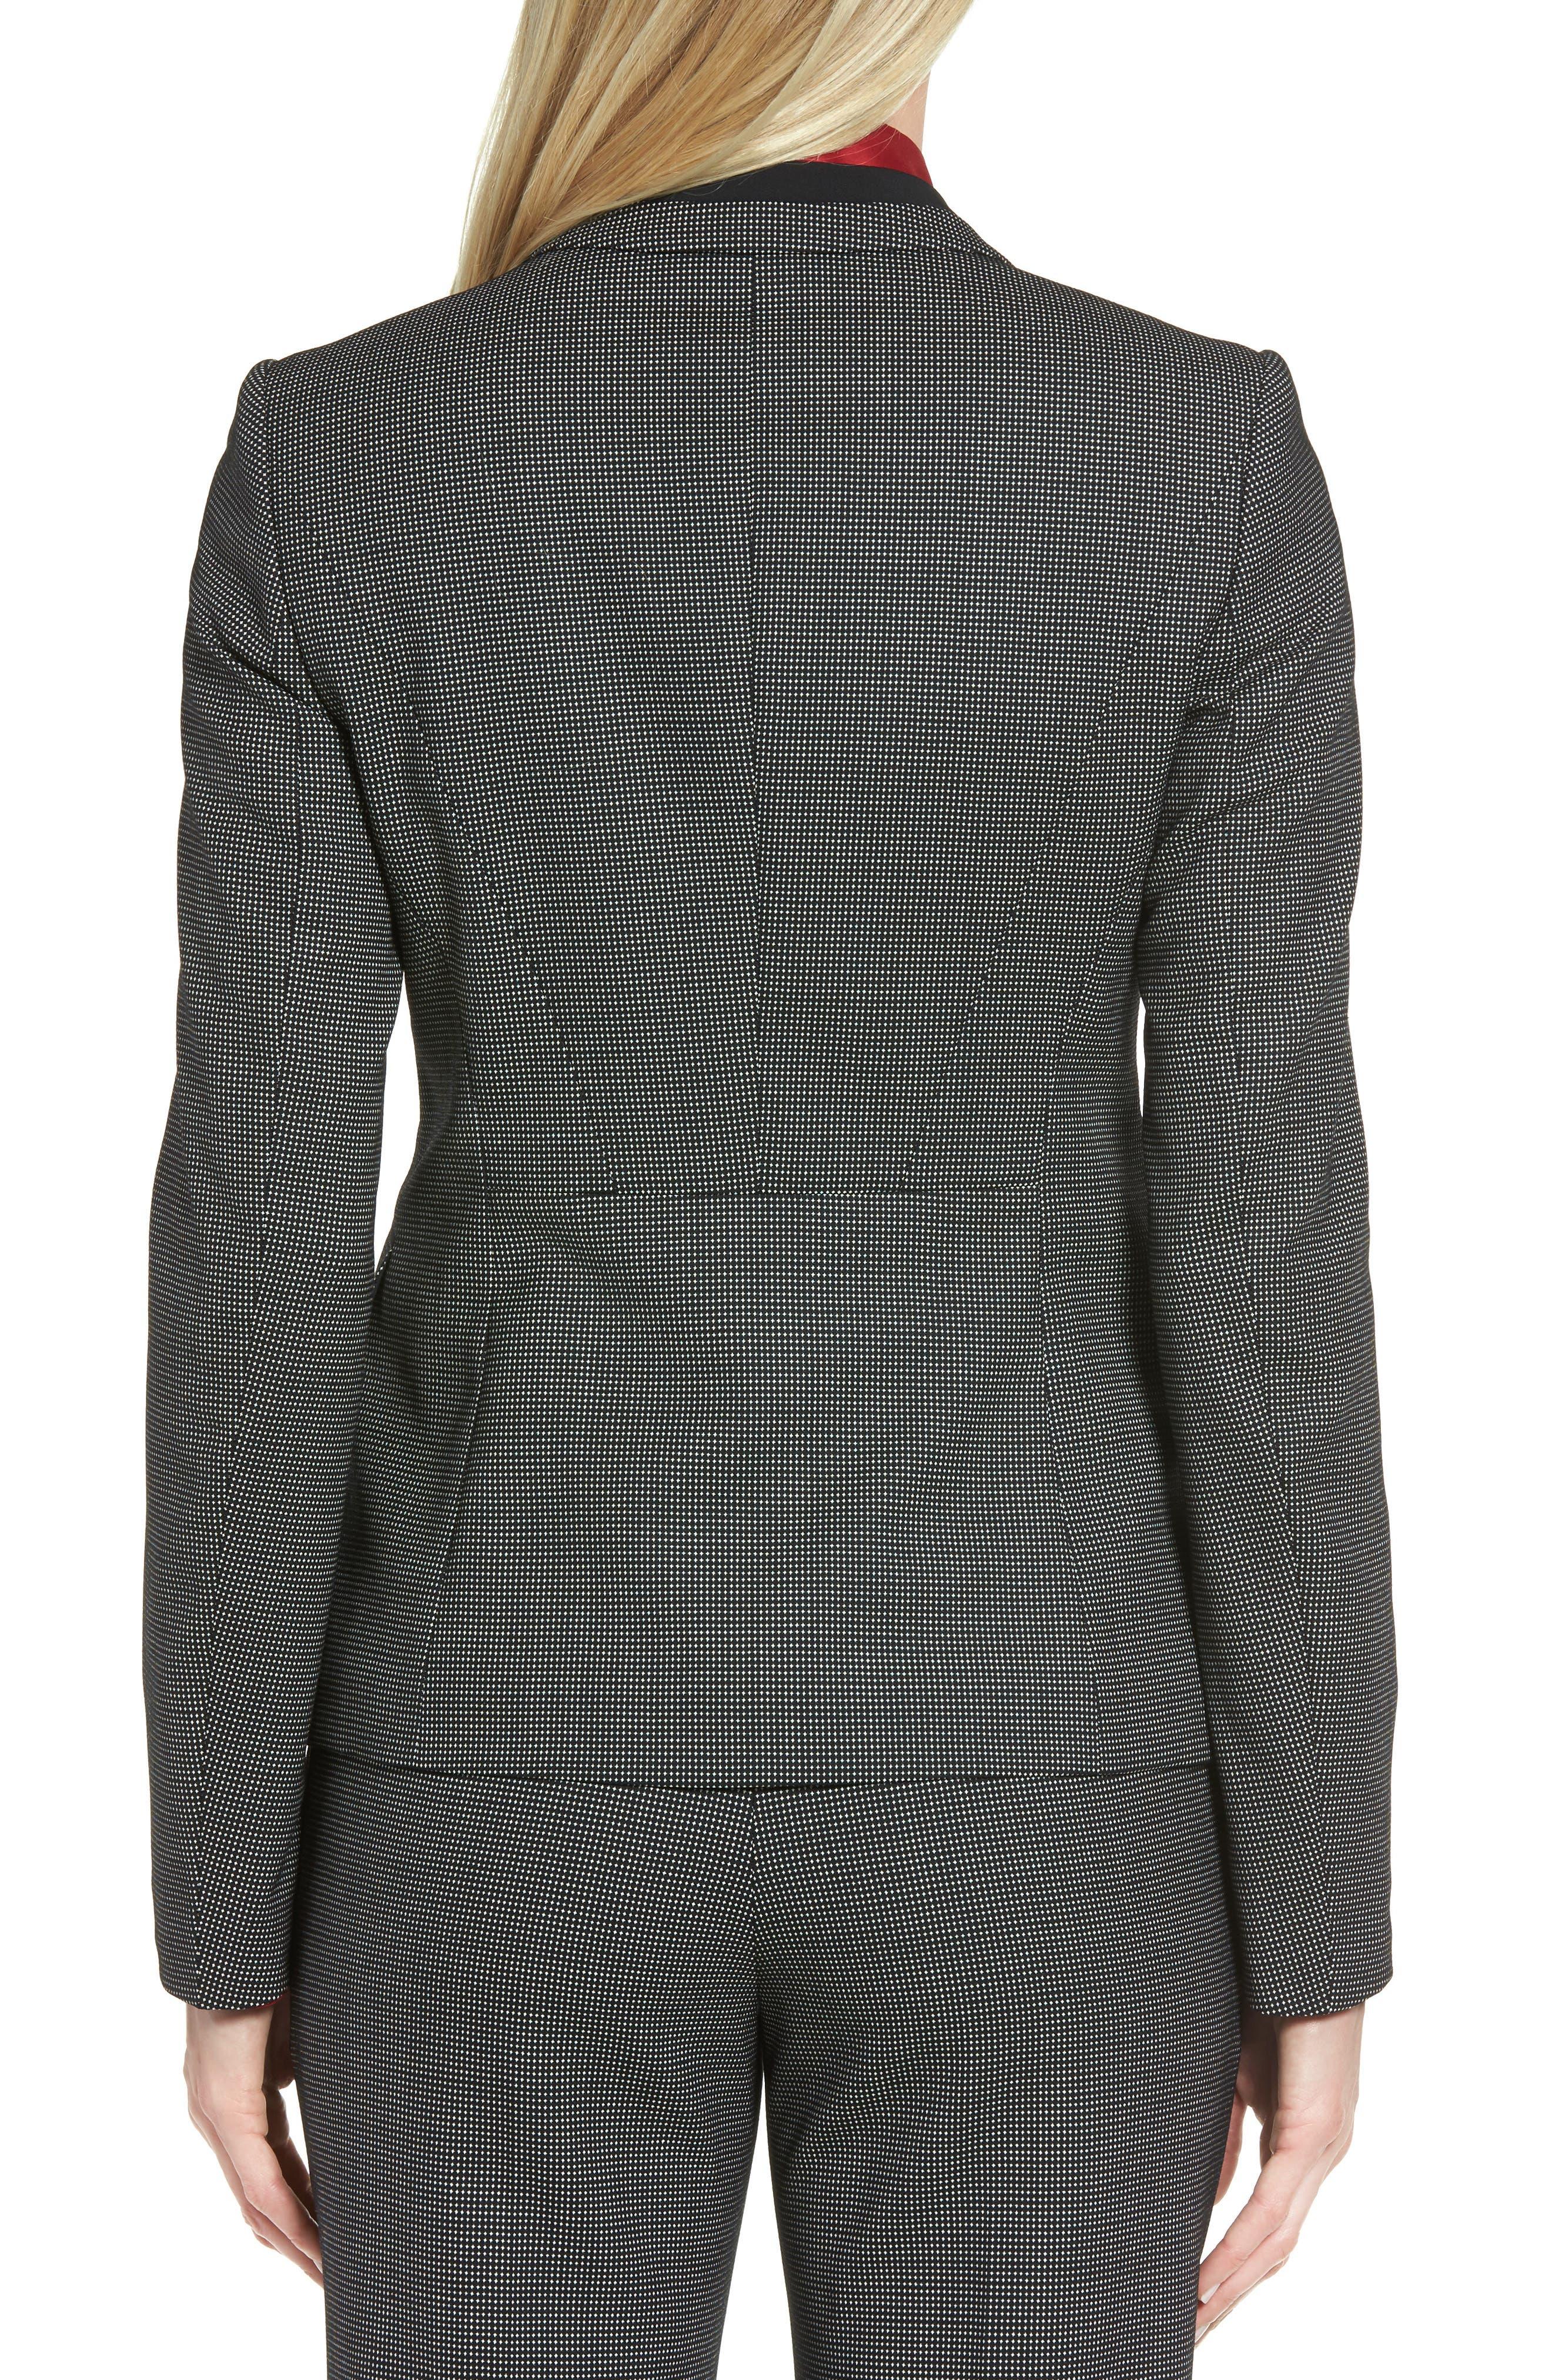 Jelisana Stretch Wool Suit Jacket,                             Alternate thumbnail 3, color,